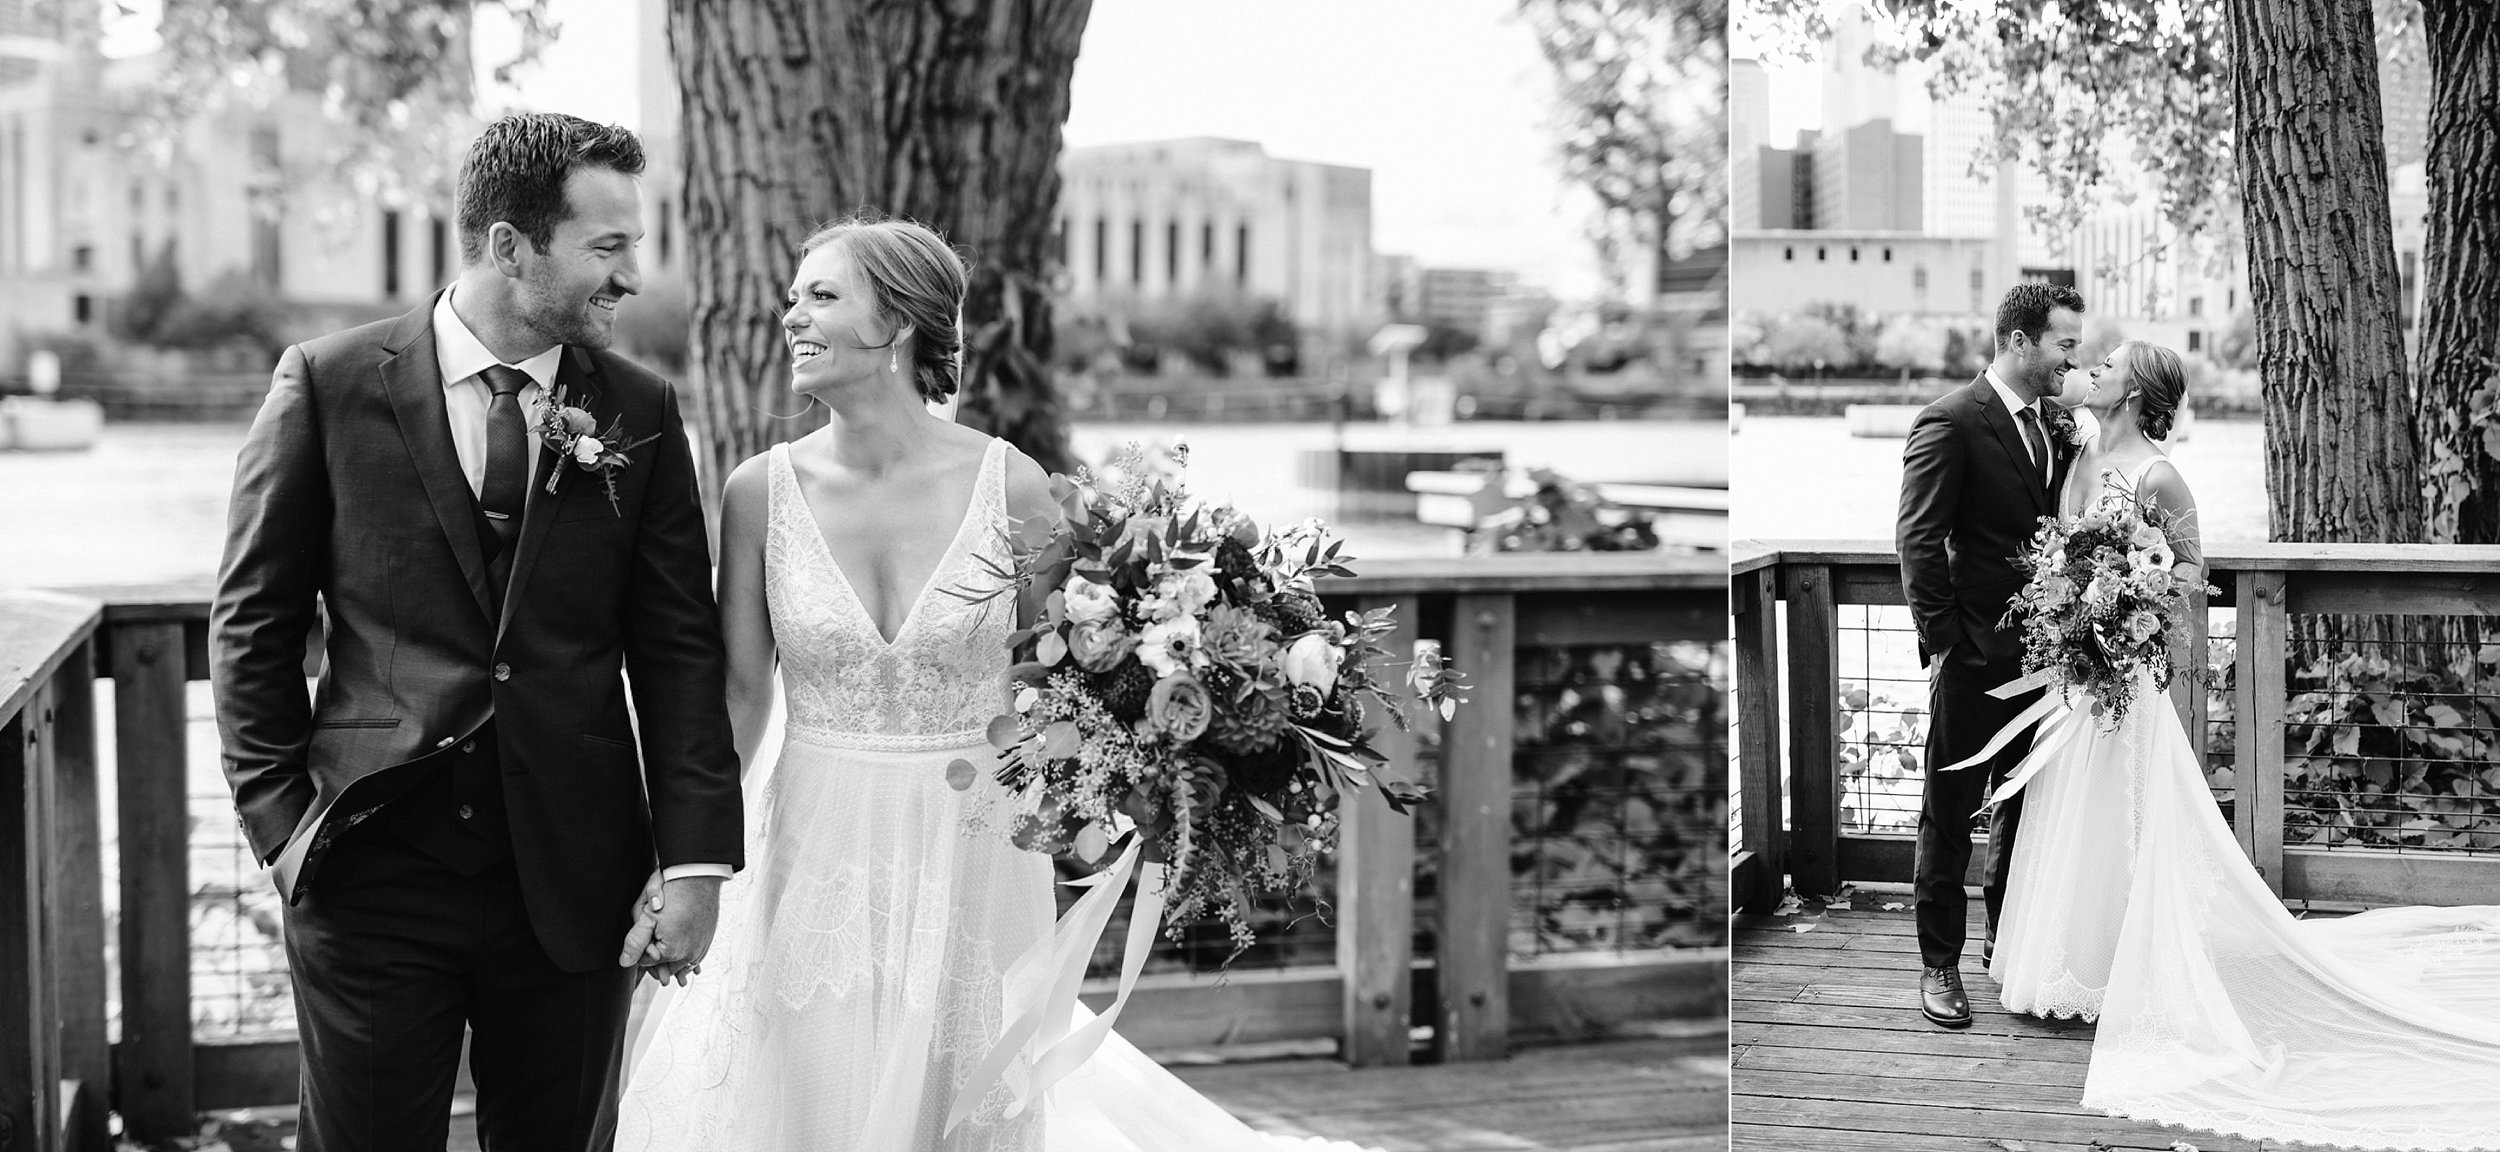 Nicollet-Island-Pavilion-Minneapolis-September-Coral-Navy-Wedding-39.jpg